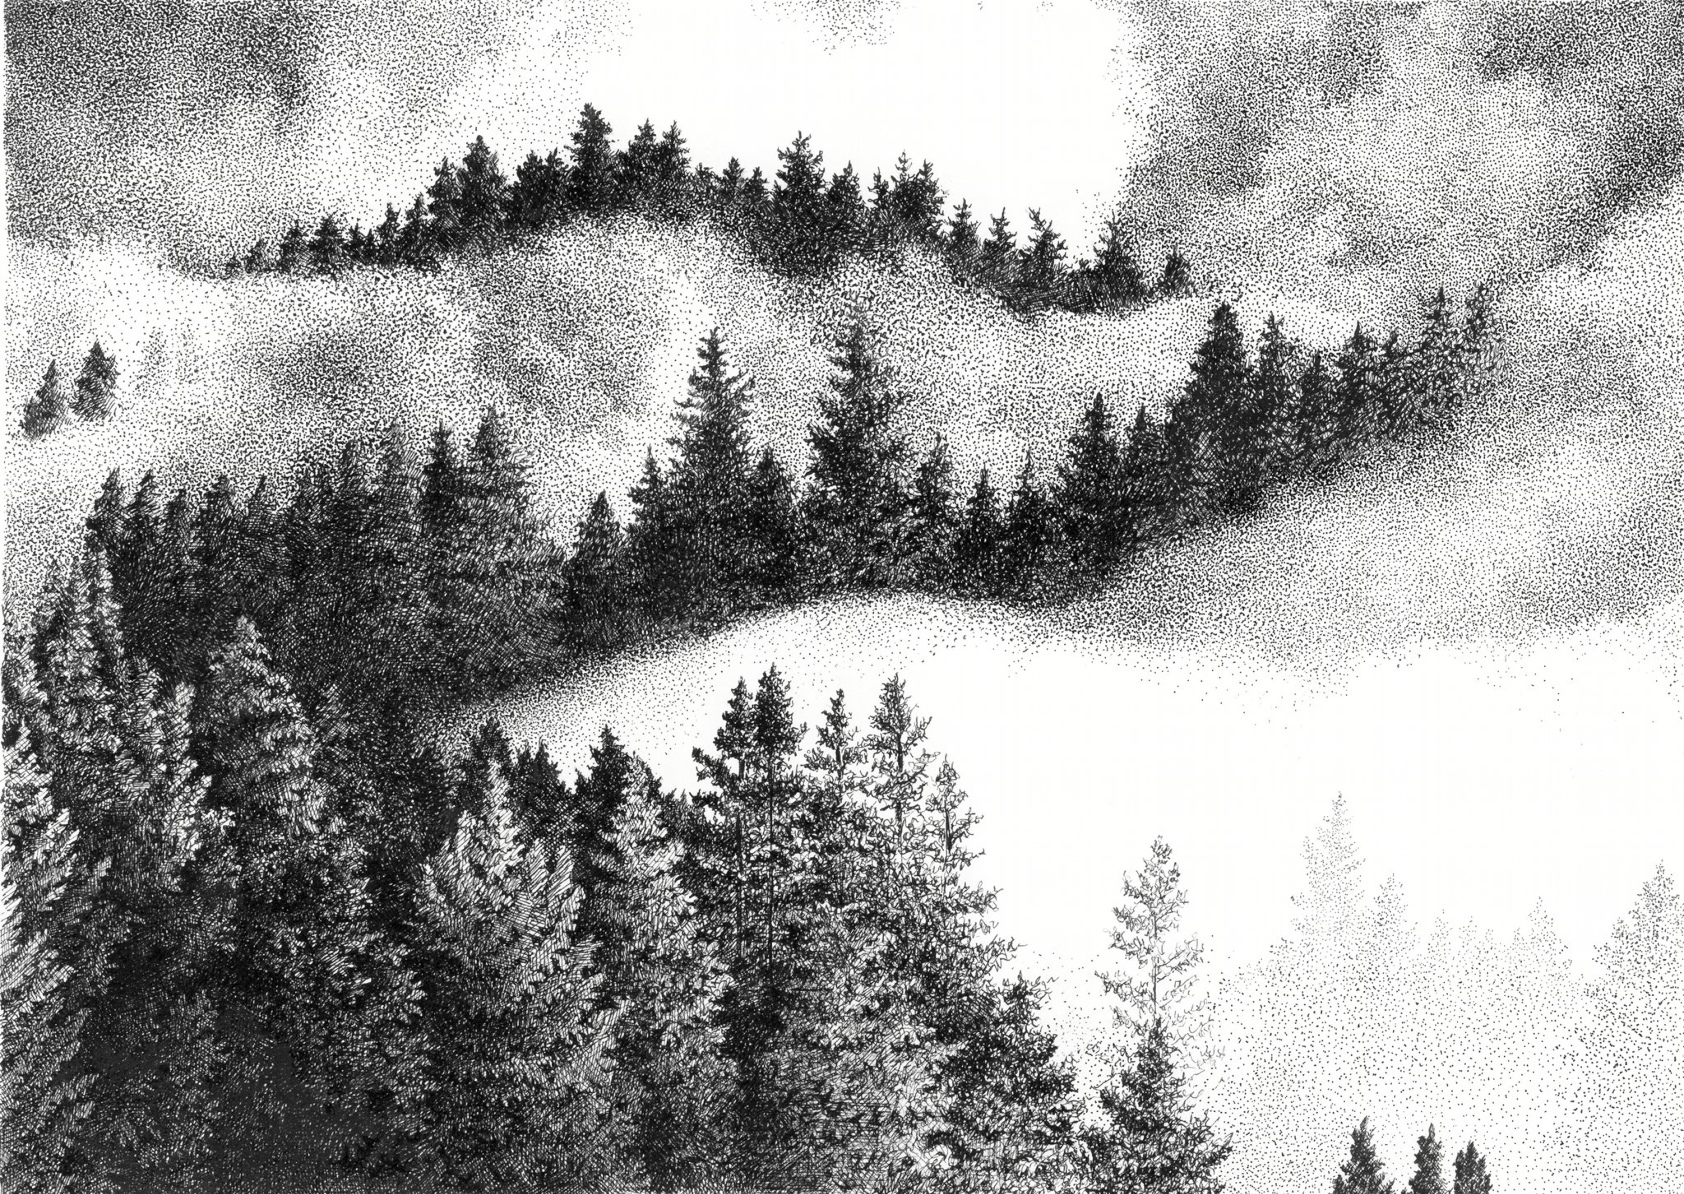 Topjian-Searle_Stacy_Smoky-Mountain-Morning